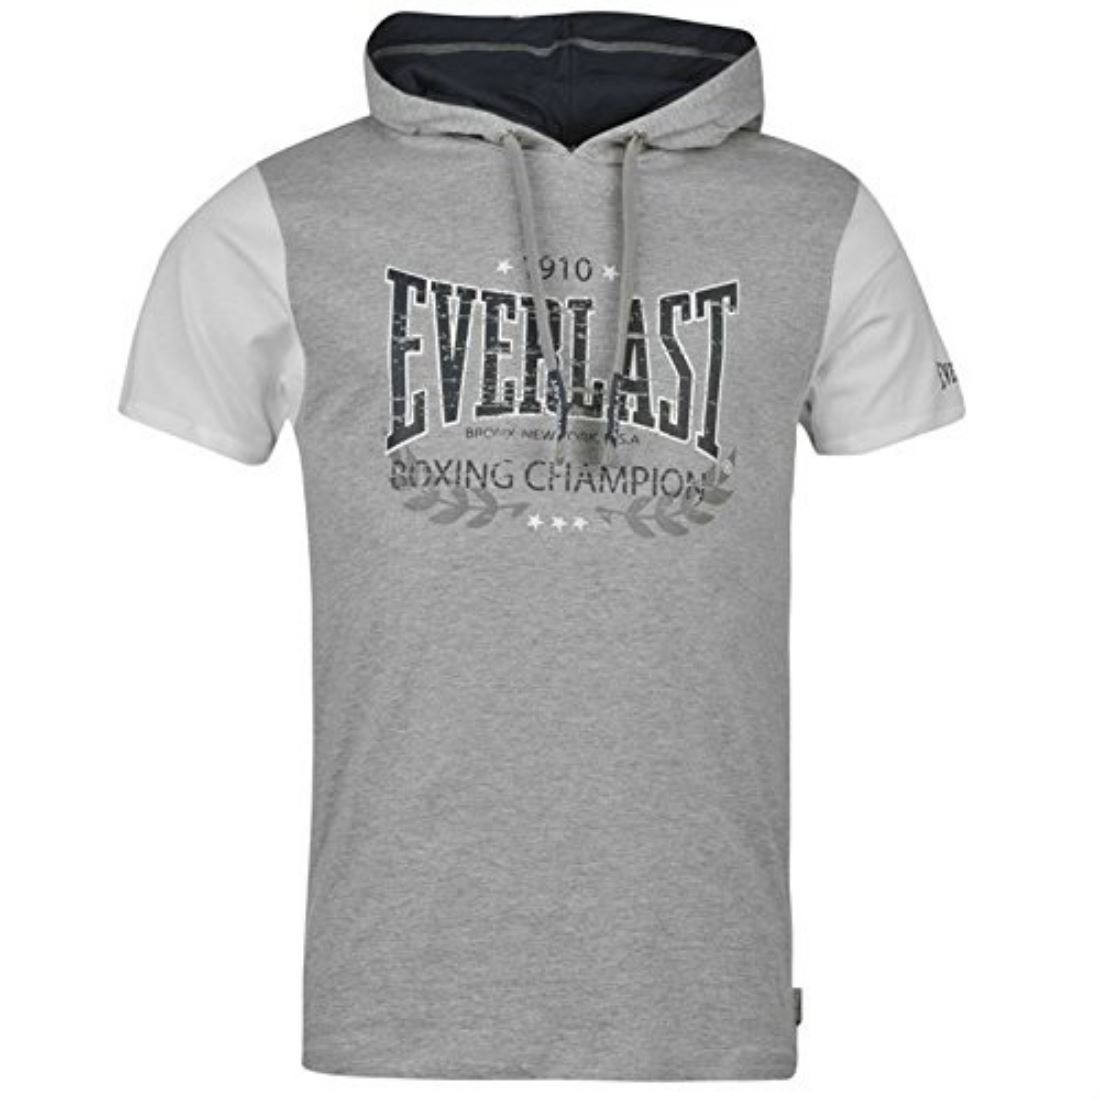 Everlast Boxing Champion Mens Hooded T Shirt Short Sleeved Tee Top Brand New